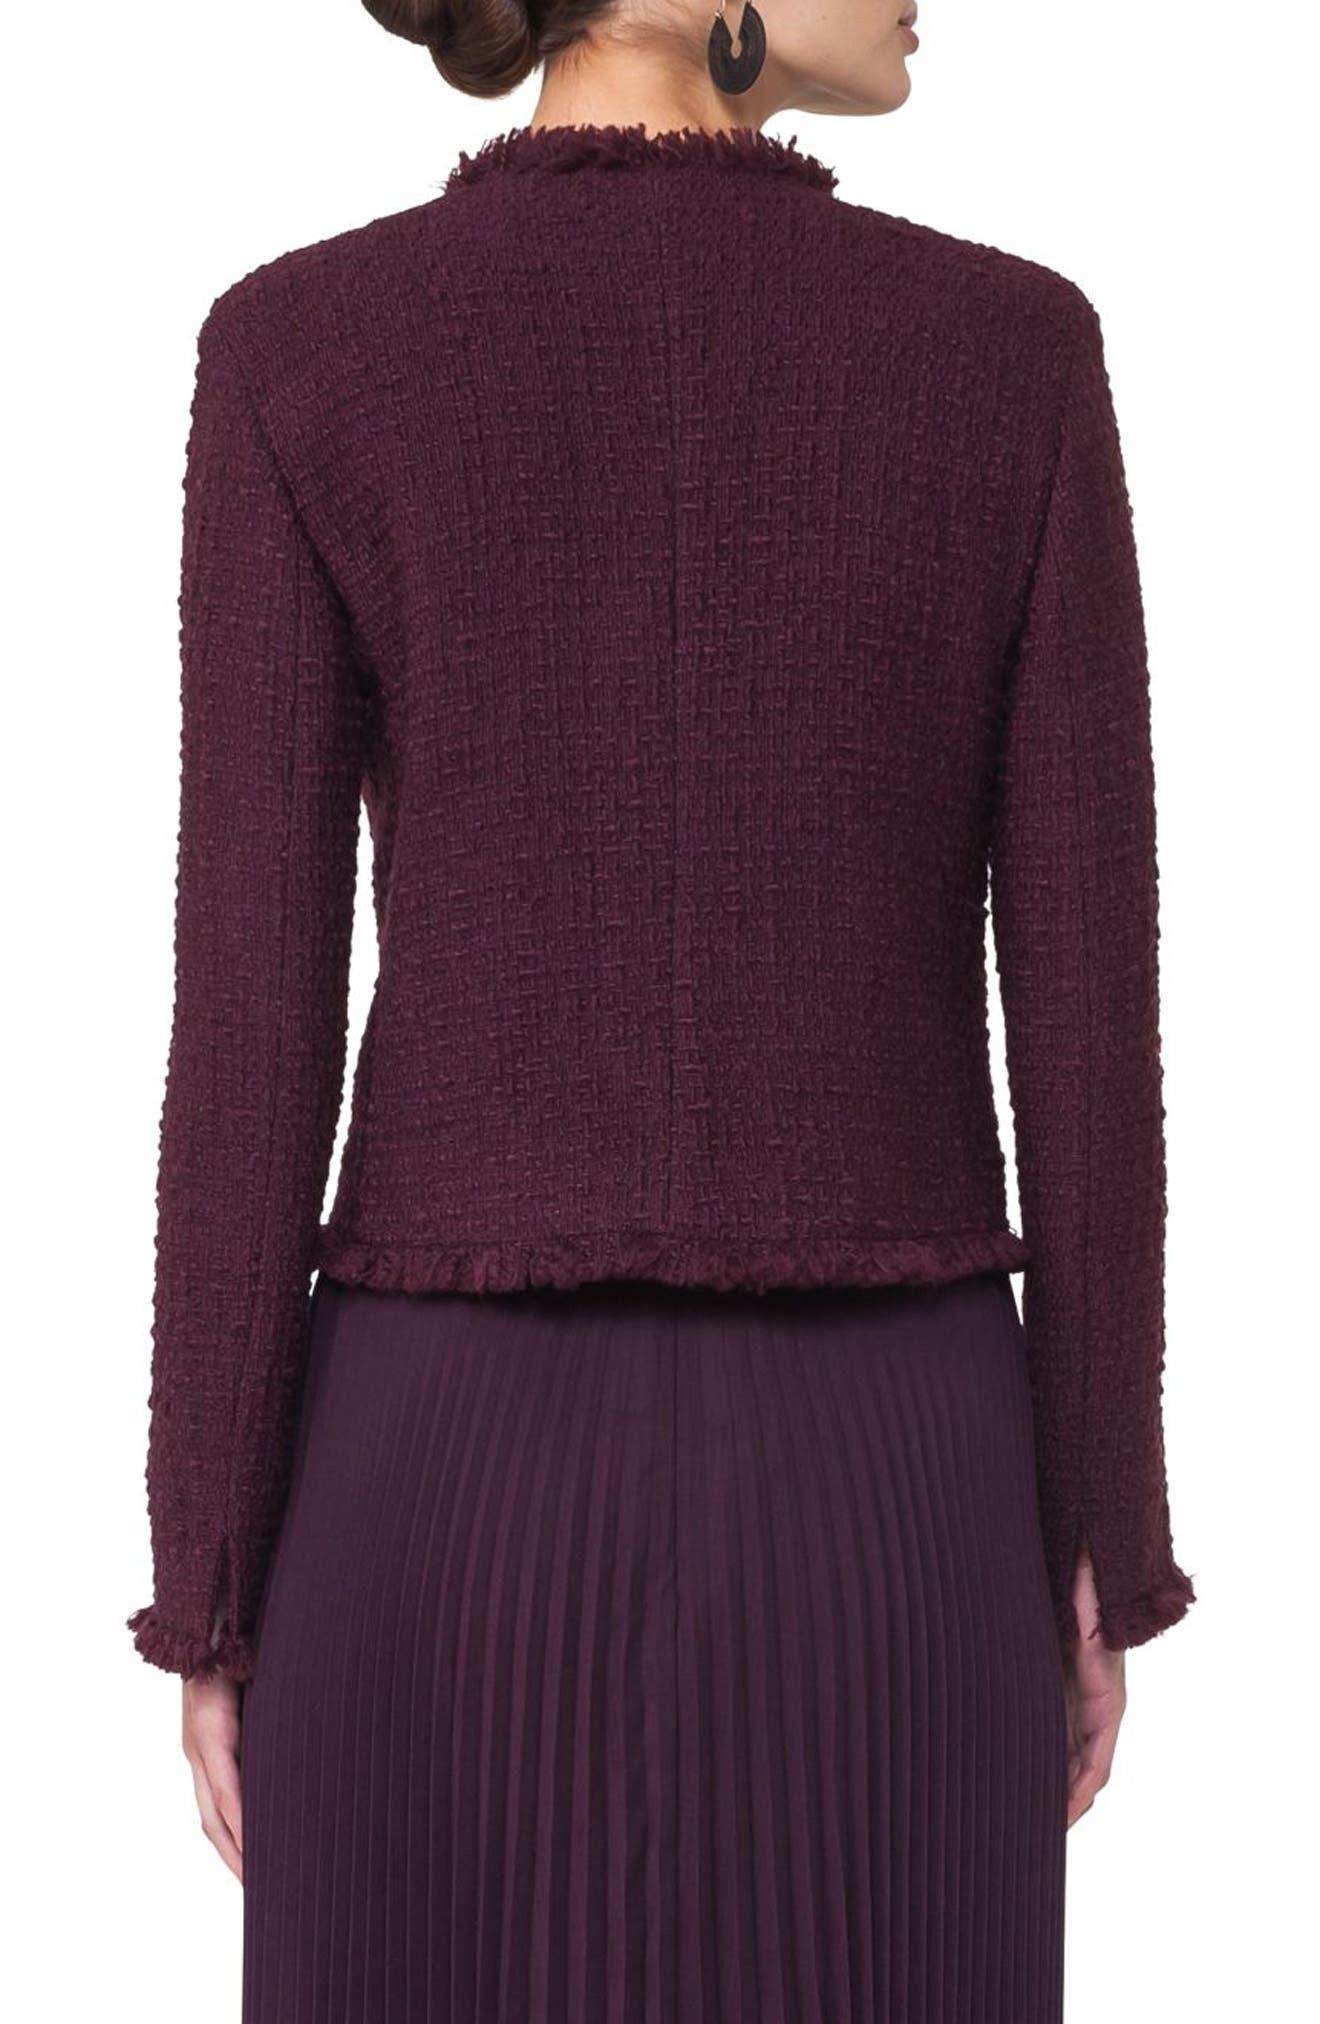 Tweed Jacket,                             Alternate thumbnail 2, color,                             930